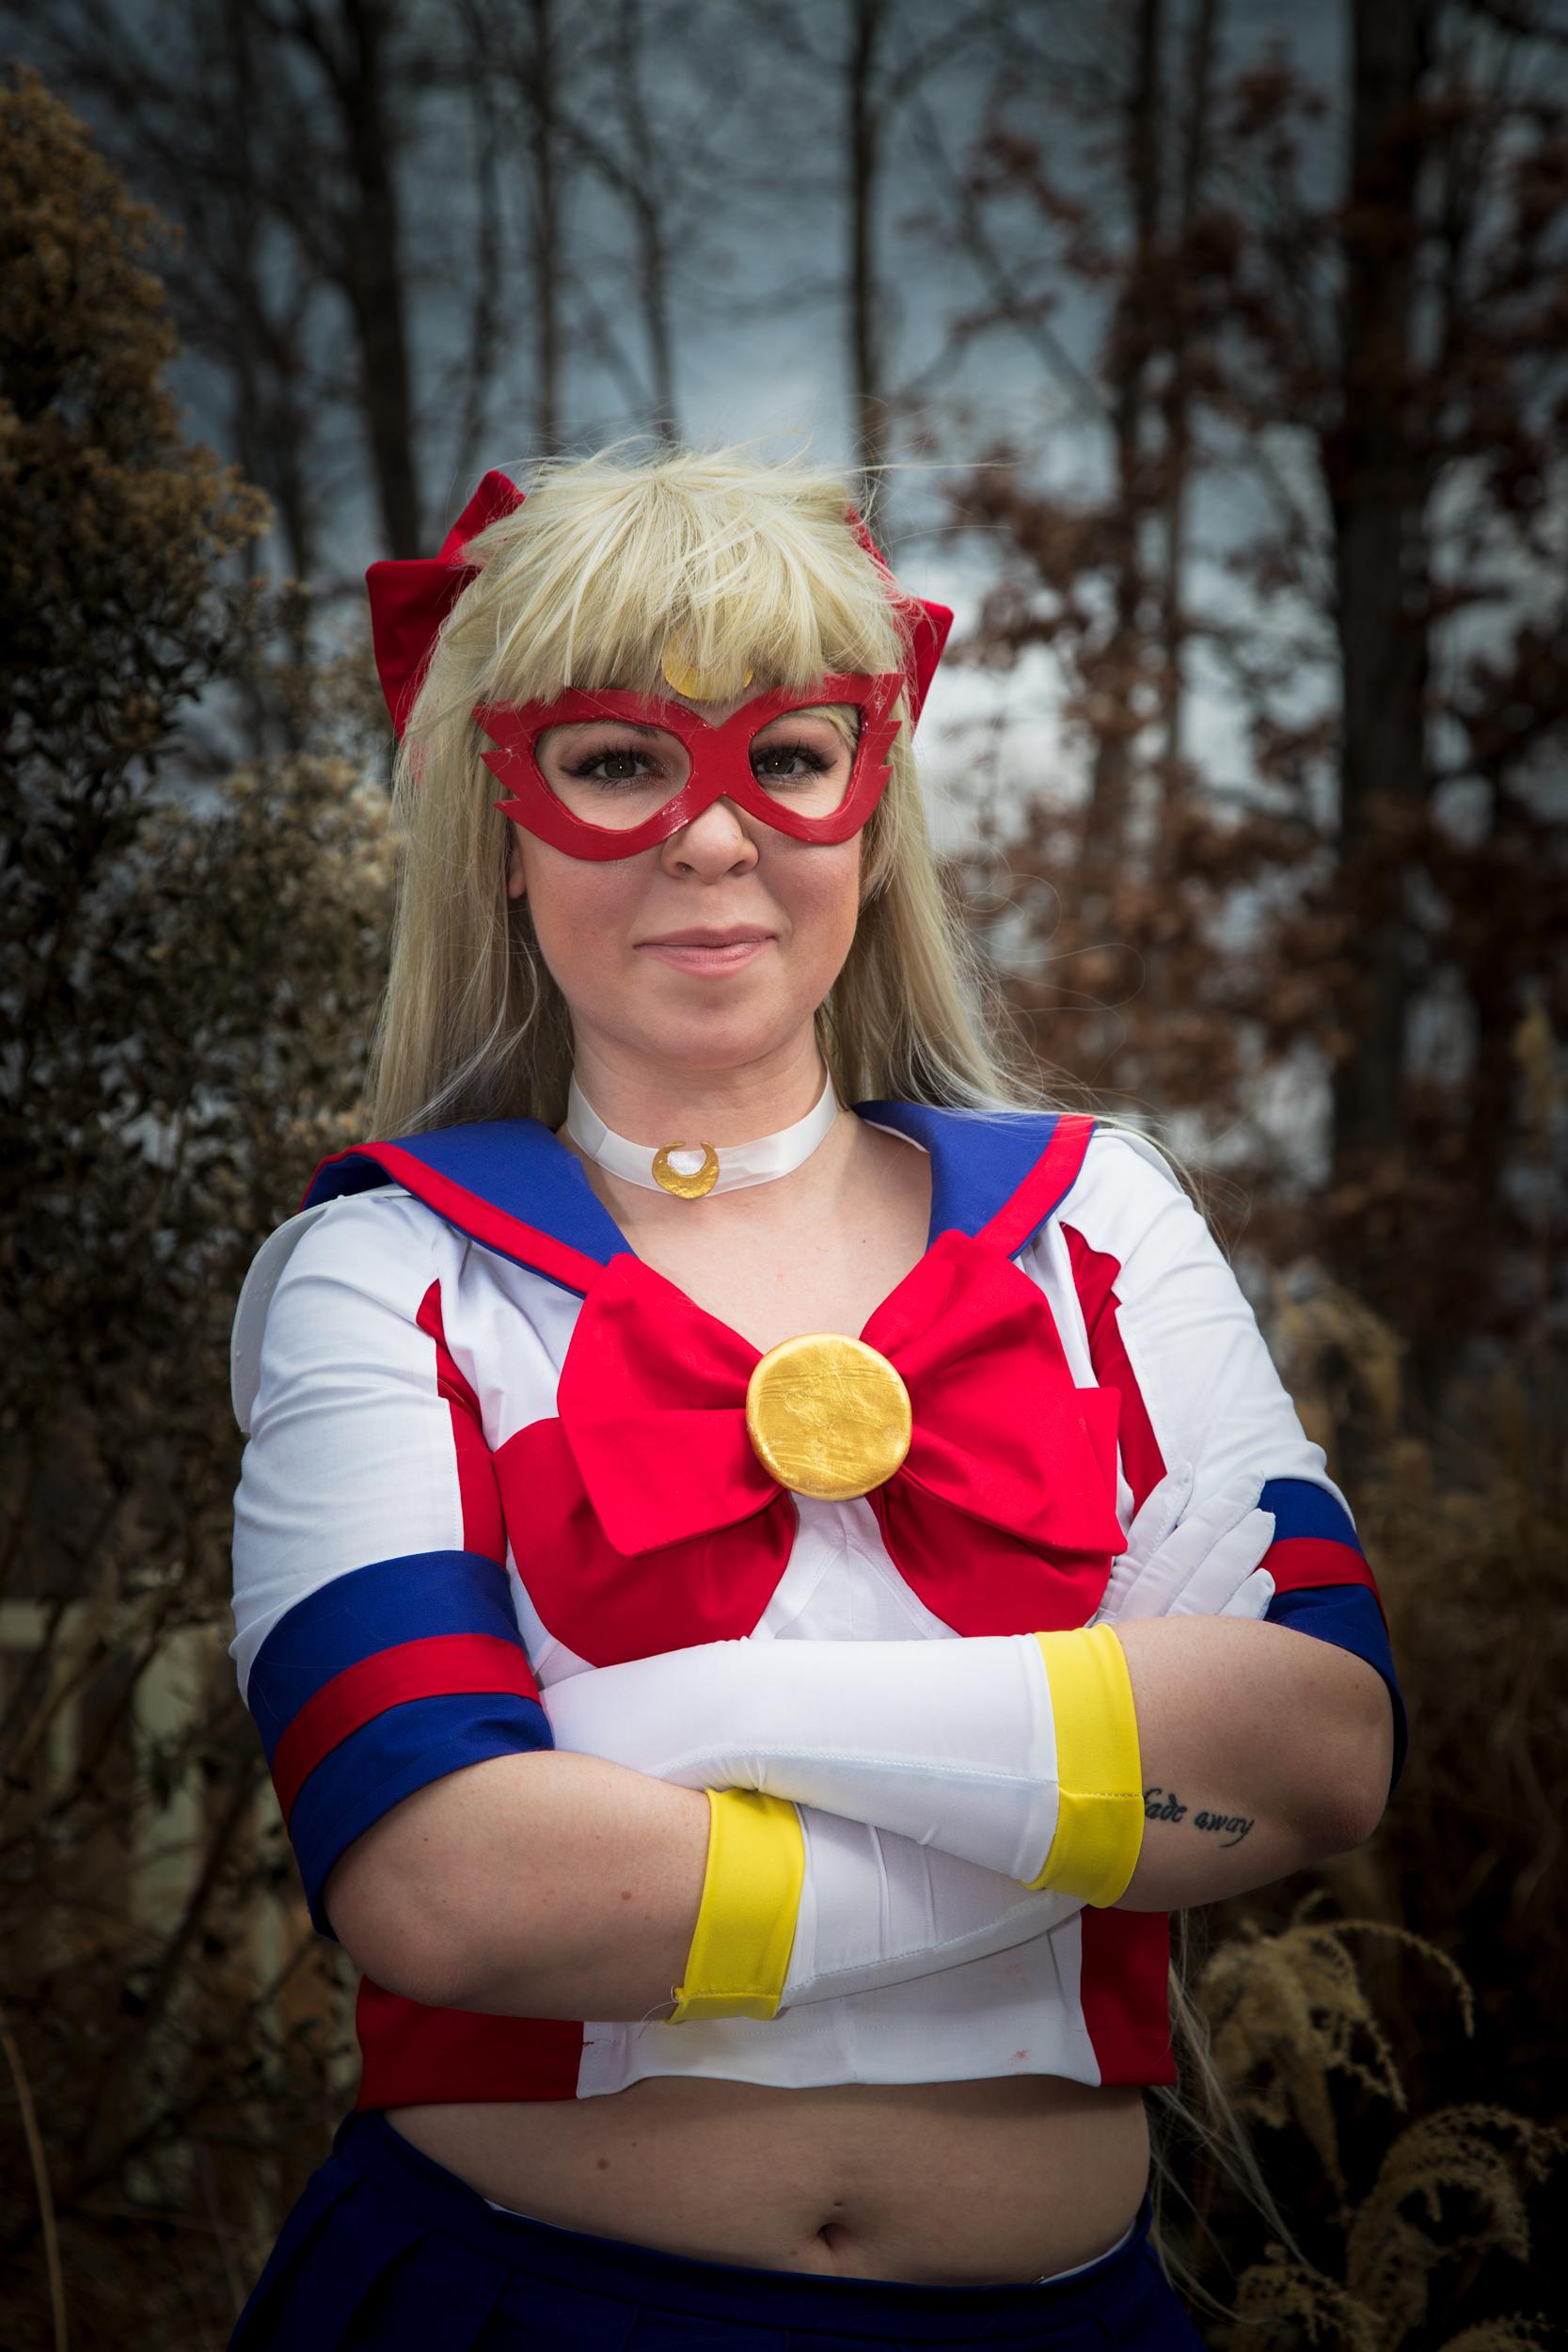 Laci-Sailor-Moon-067-Edit.jpg